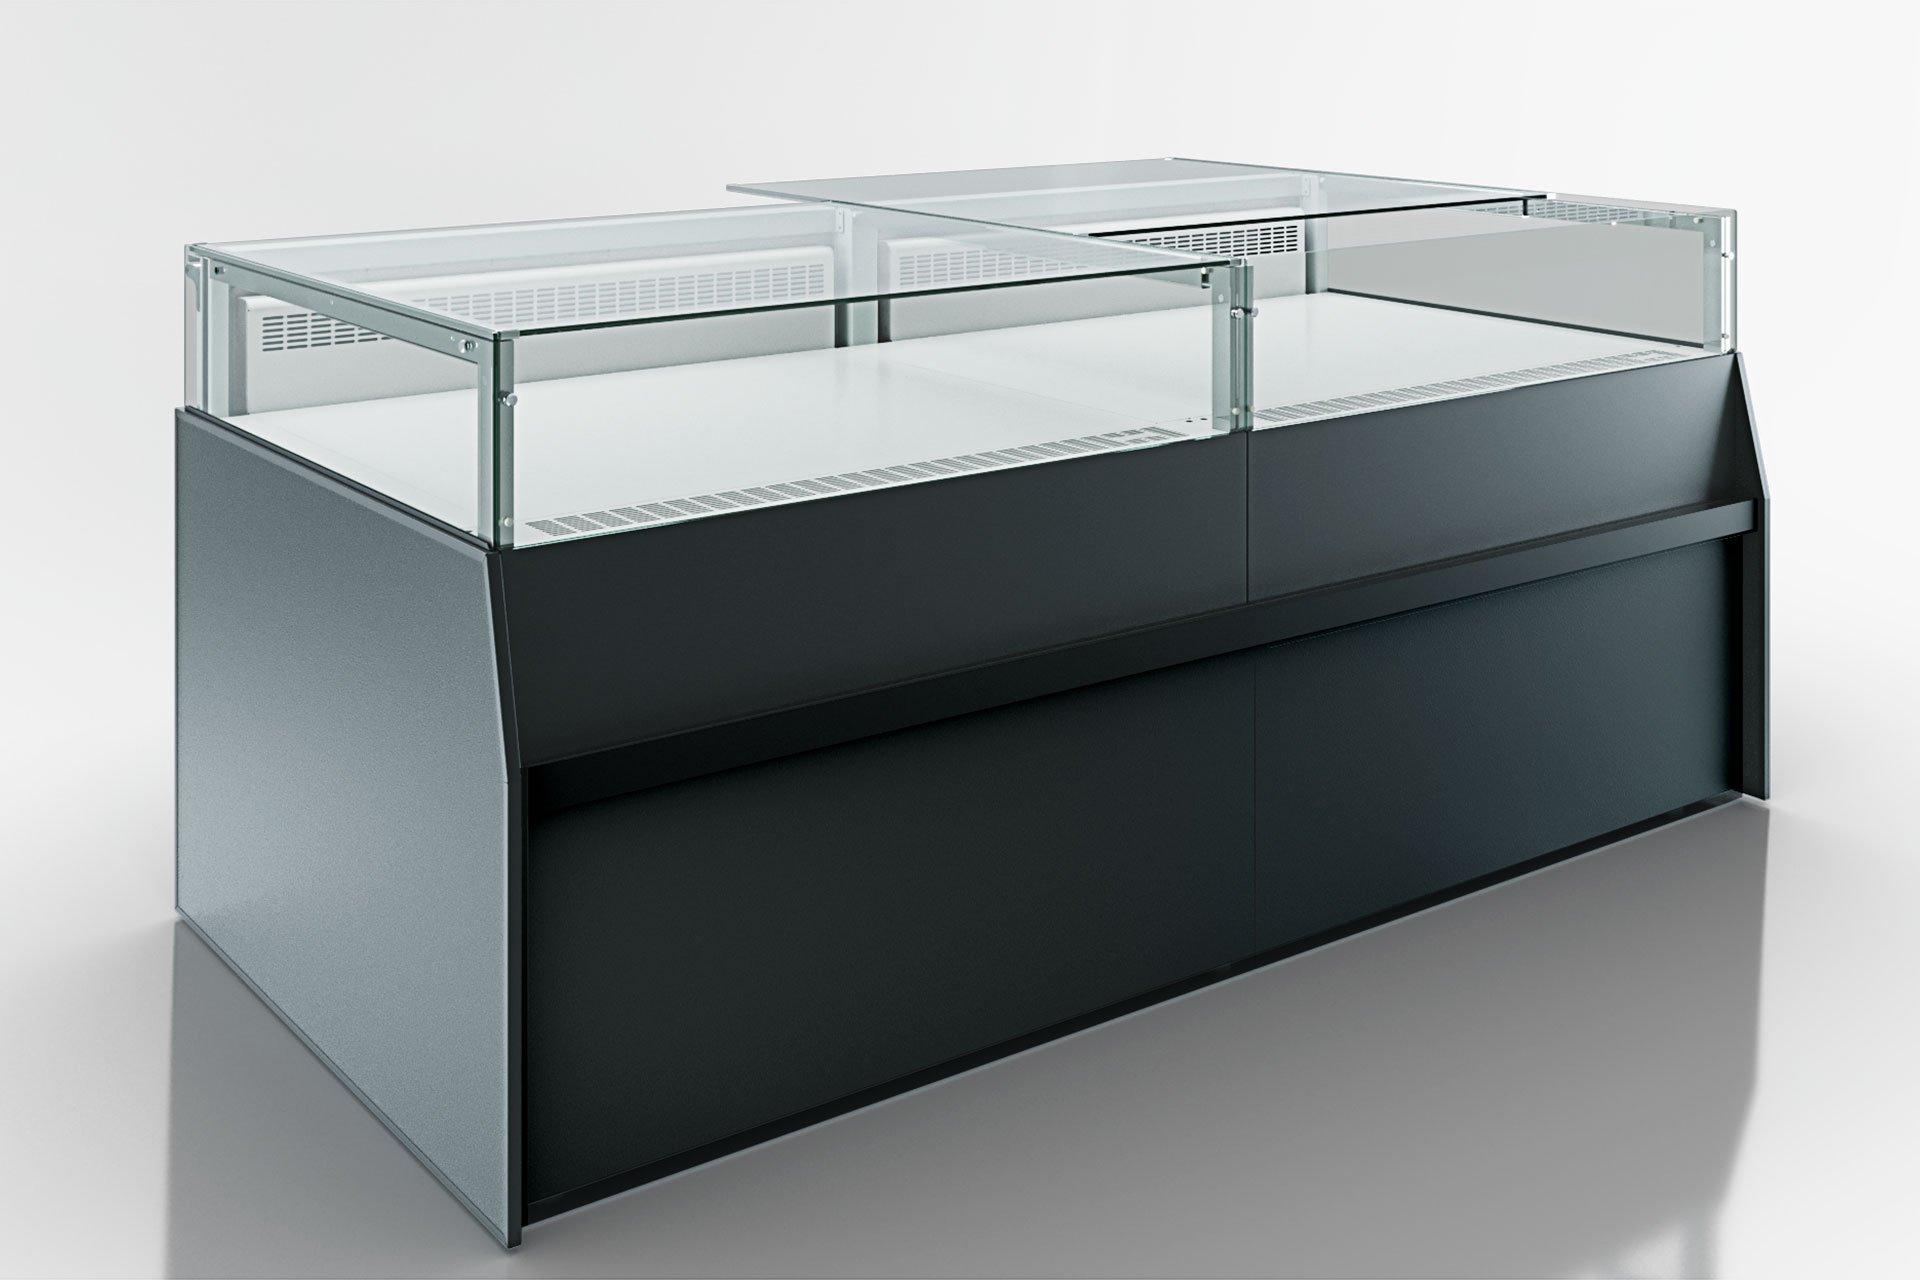 Refrigerated counters Missouri MC 120 patisserie СН SP 110-DLM/DLA